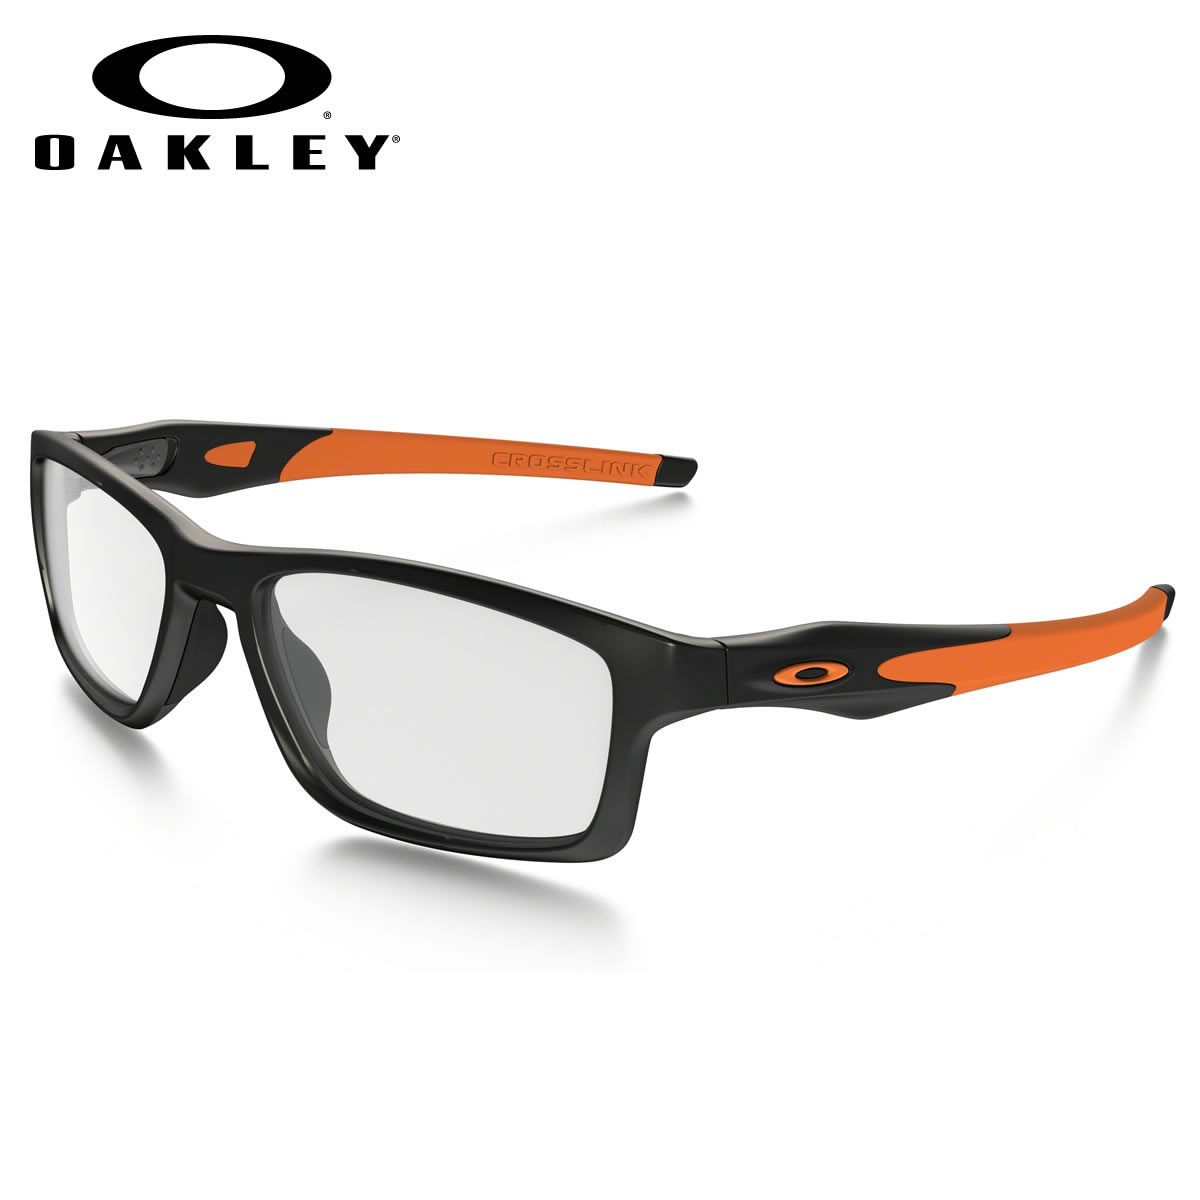 3f047b4ad7 -OAKLEY glasses OX8090-0155 CROSSLINK MNP Satin Black Team Orange  cross-linking MNP square OAKLEY ITA eyeglass lens free men women